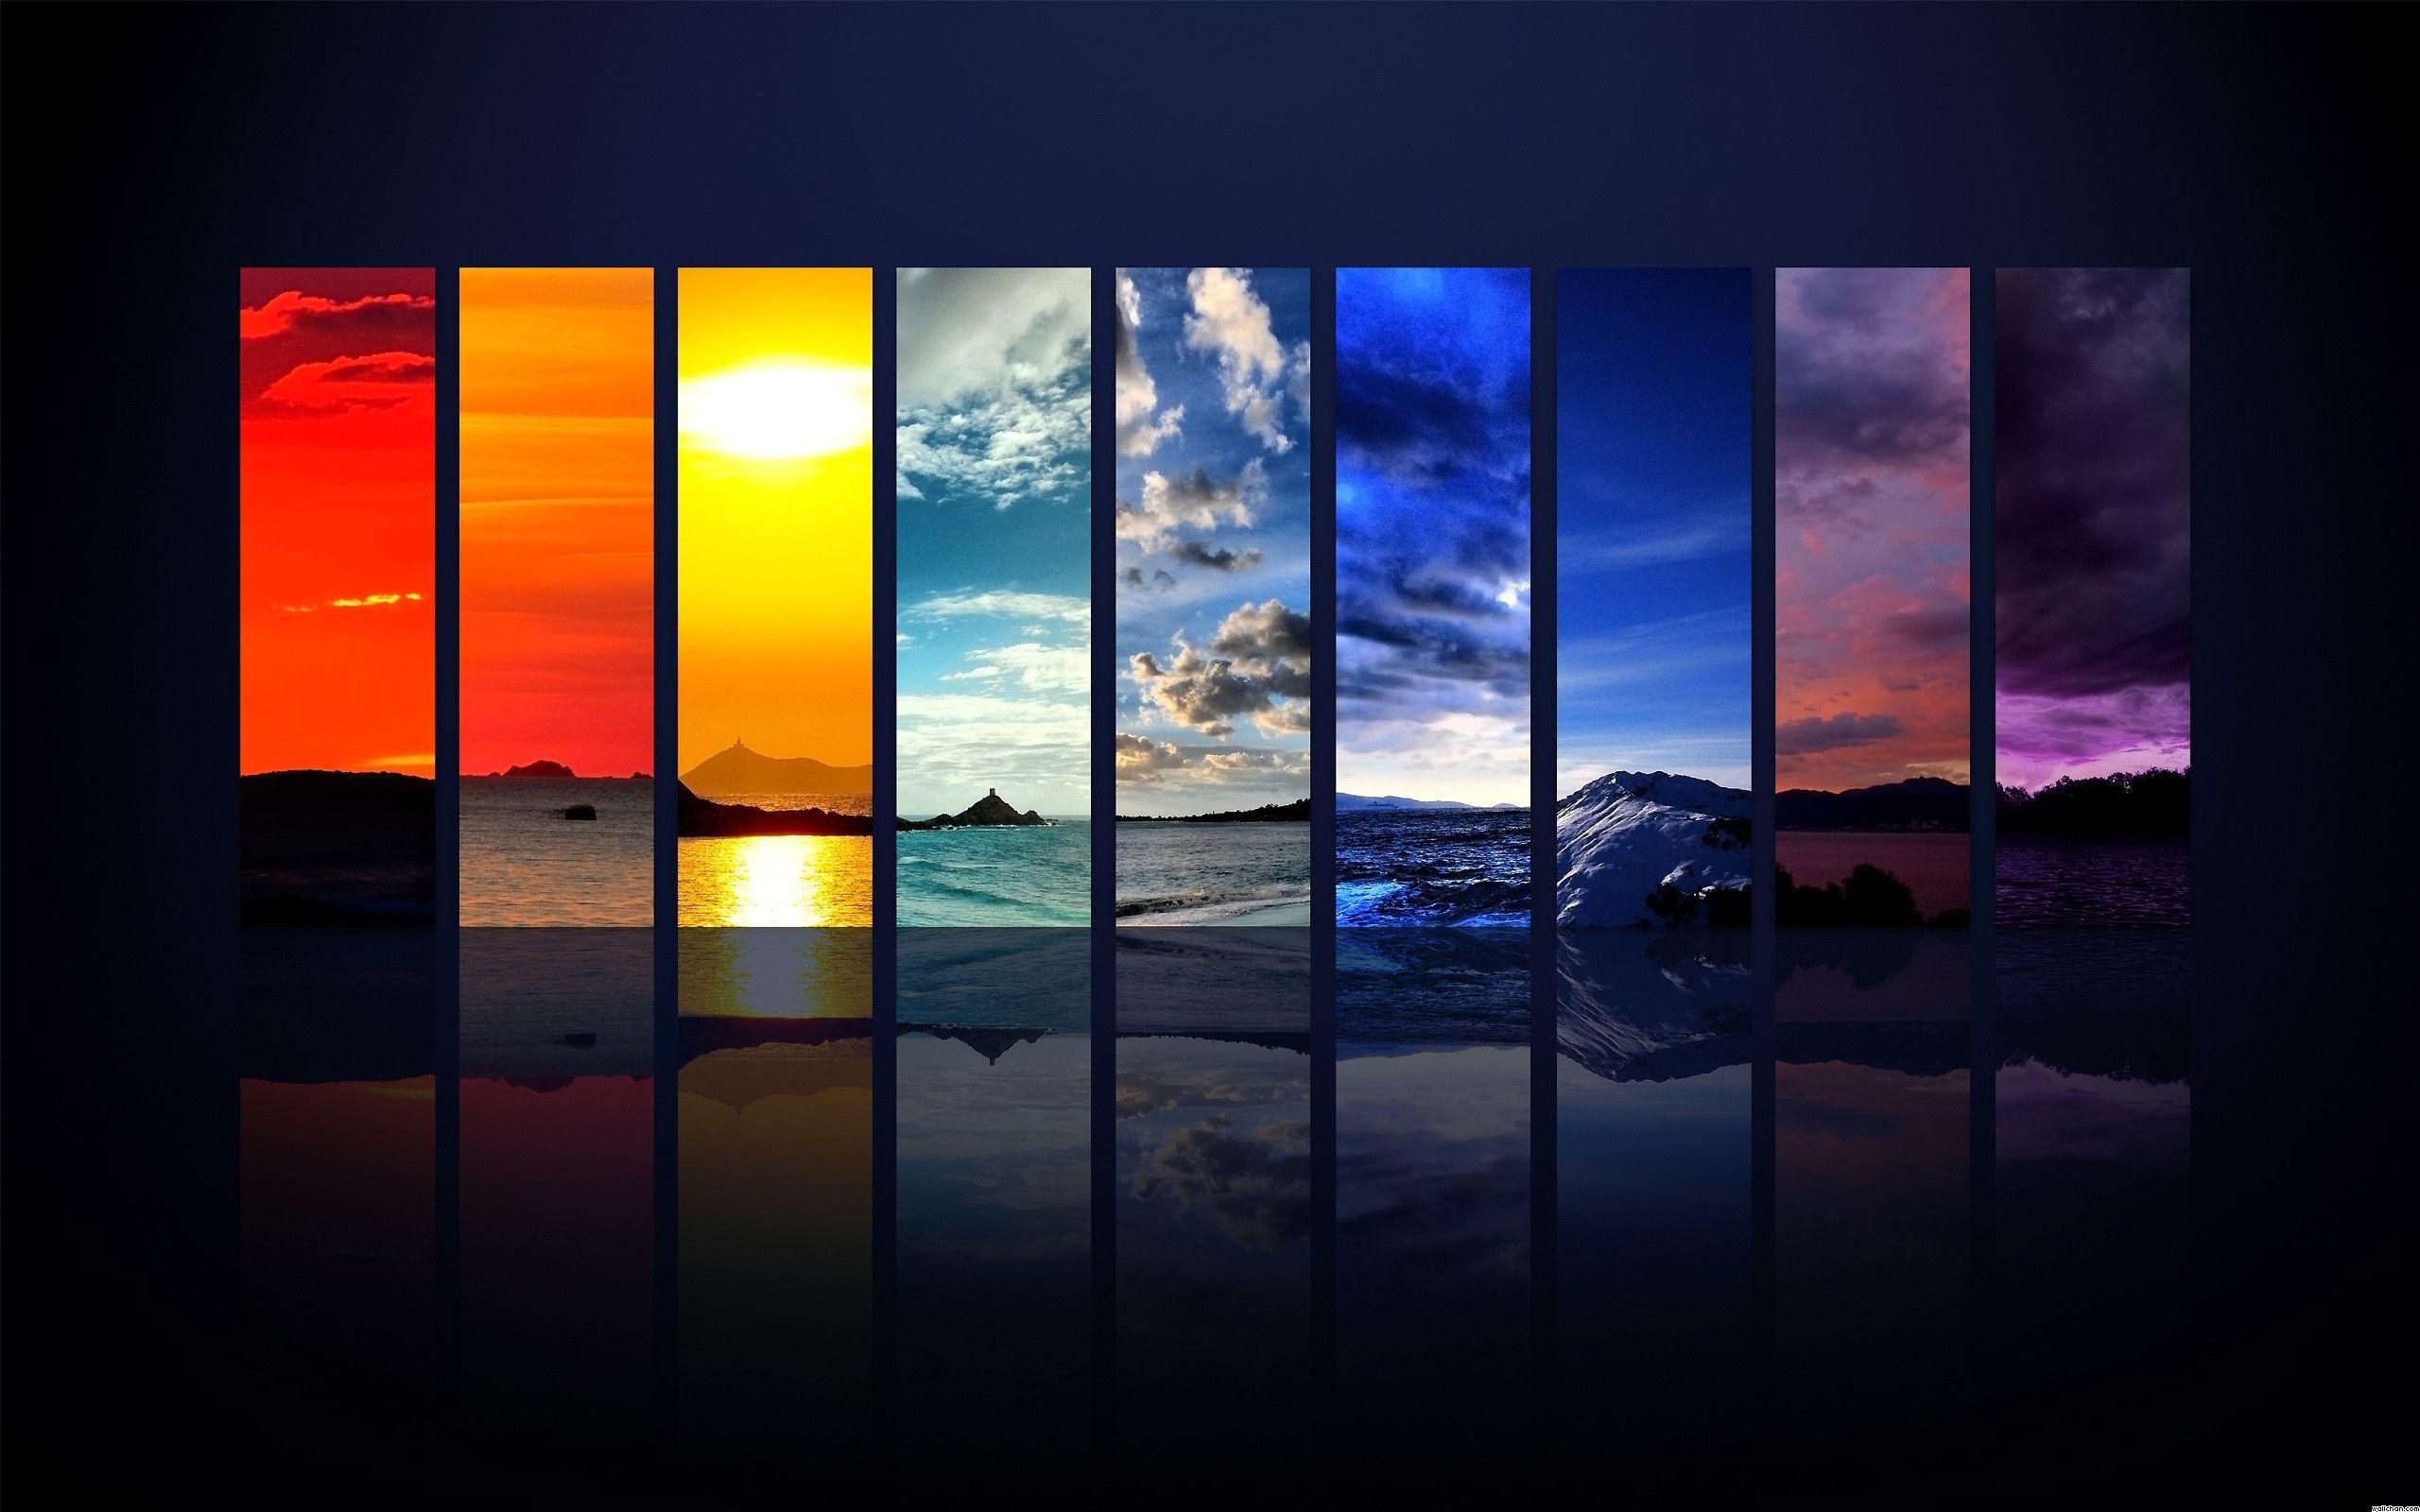 Ravishing Rainbow Desktop Wallpaper Wallpapers Hd Wallpaper Art